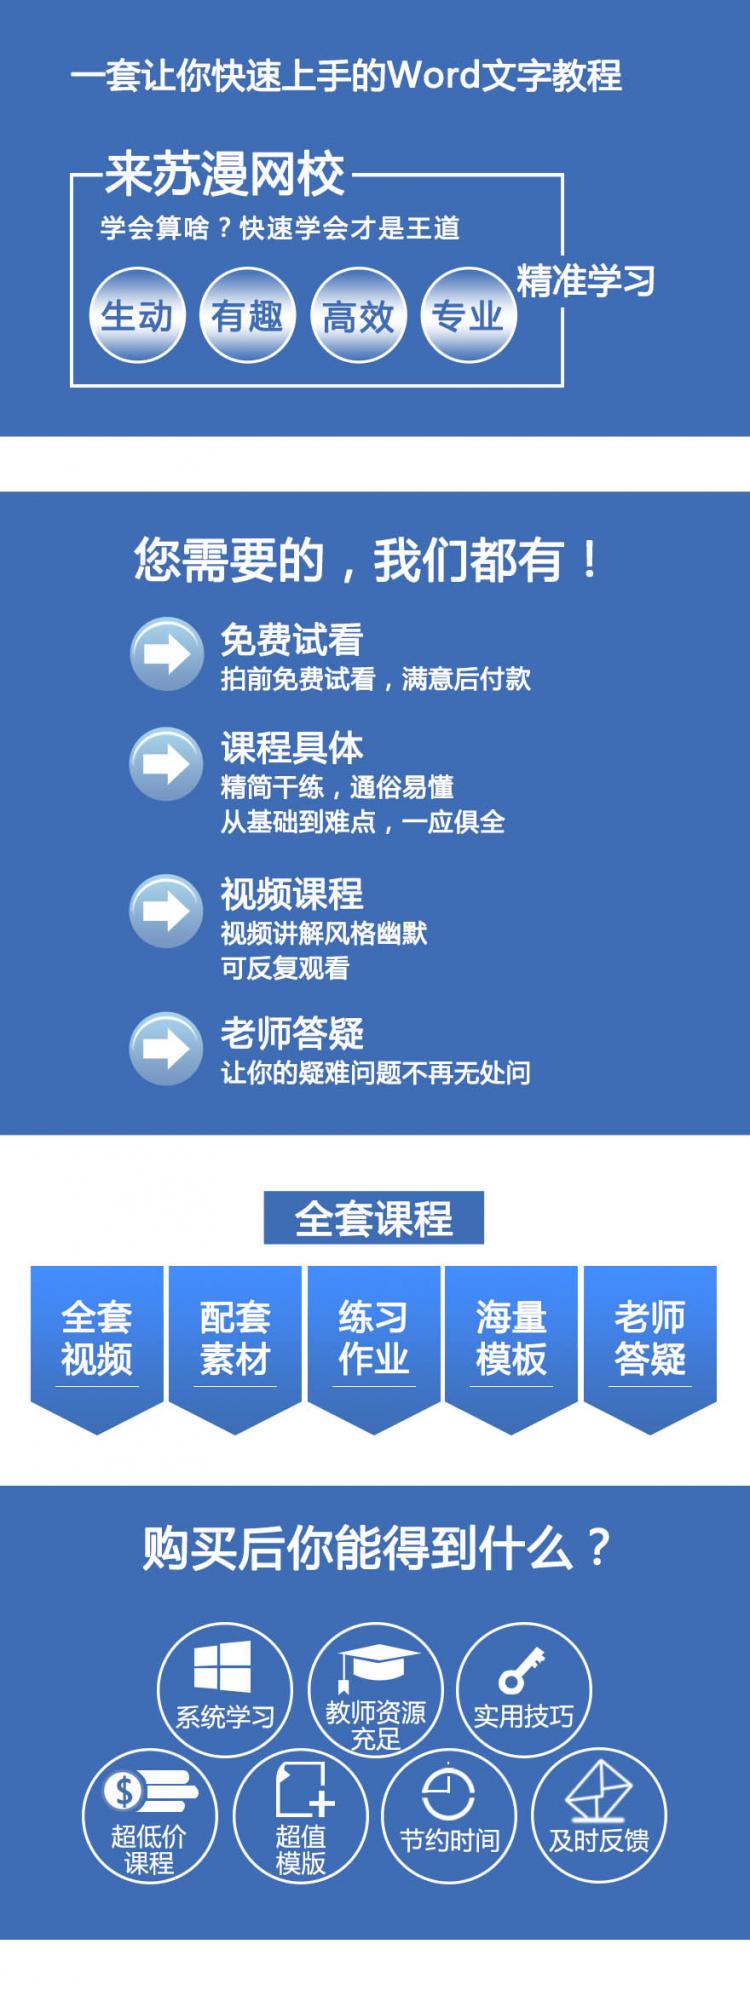 5Word文字课程详情页.jpg